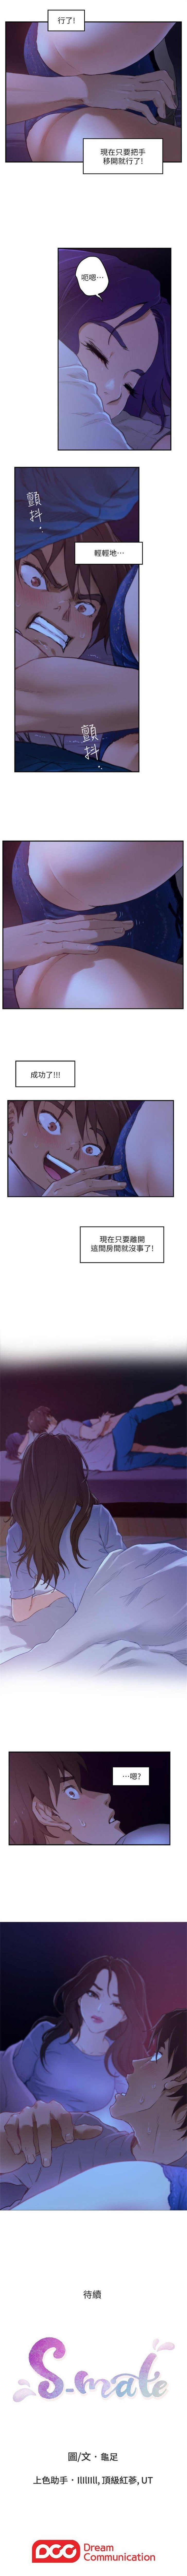 S-Mate 1-10 中文翻译(更新中) 18